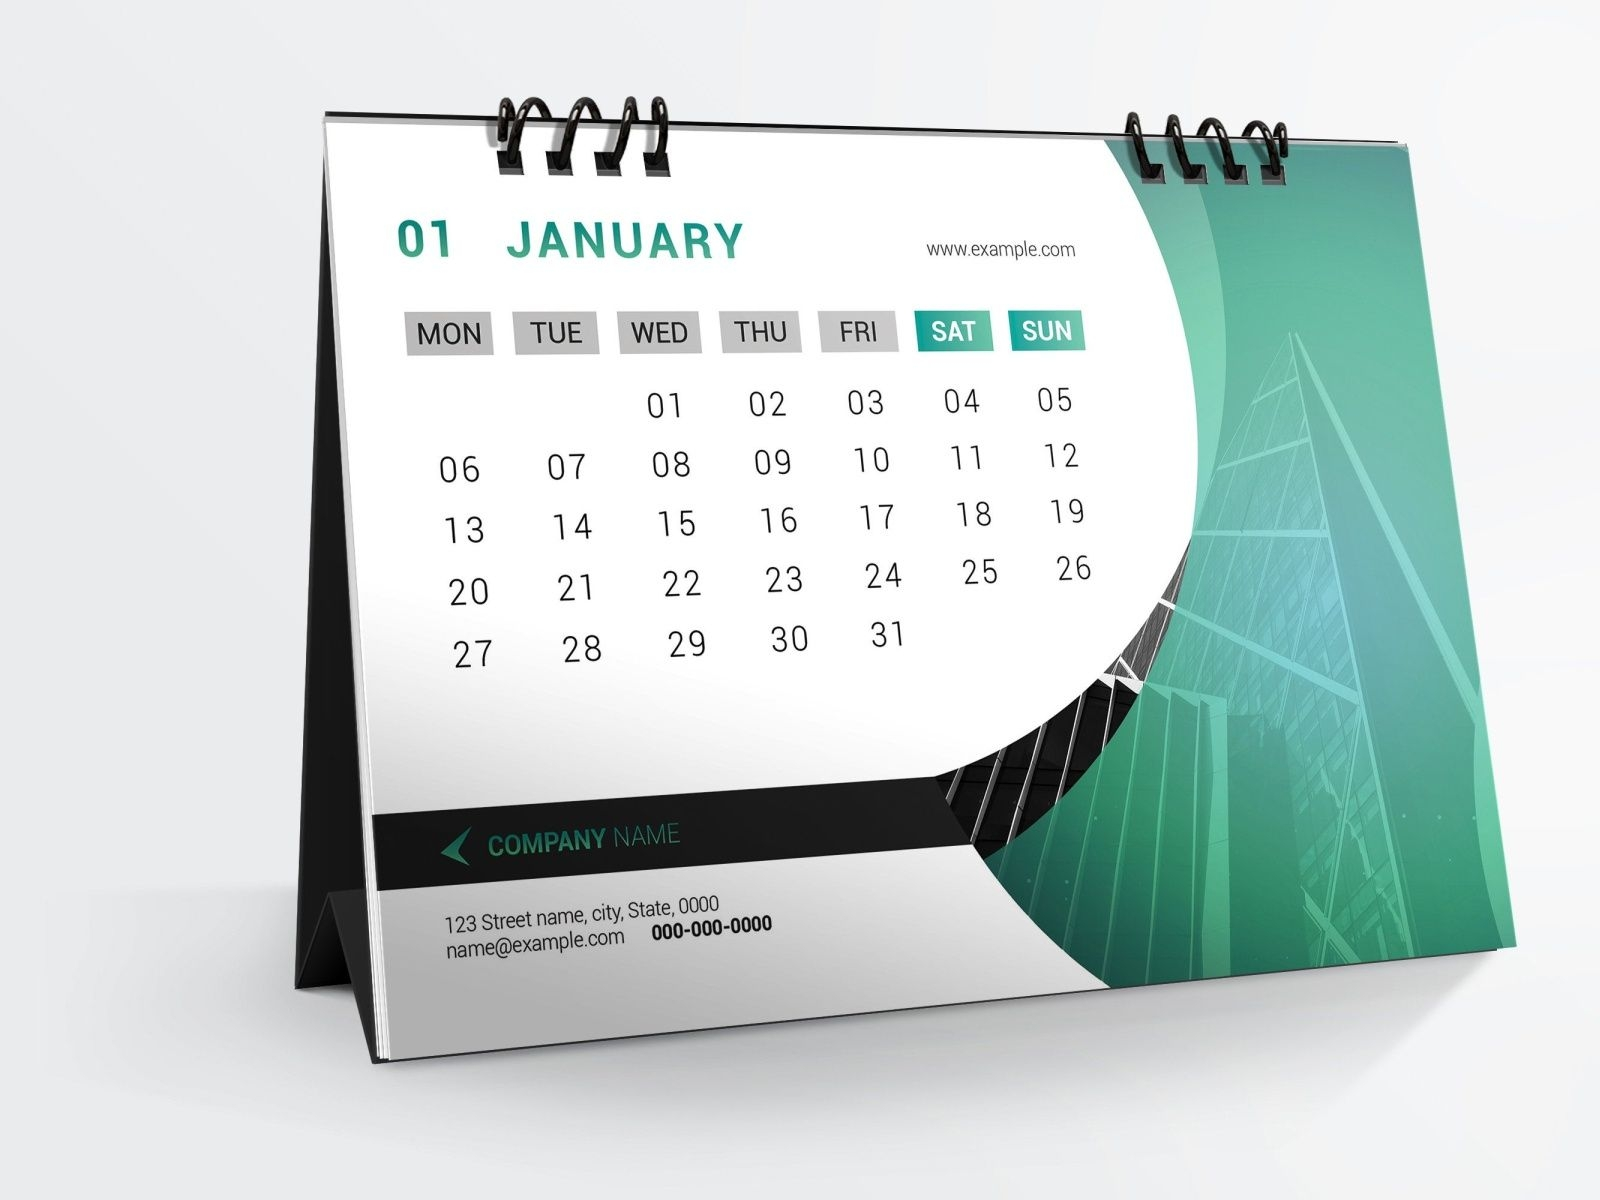 desk calendar template 2020mukhlasur rahman on dribbble